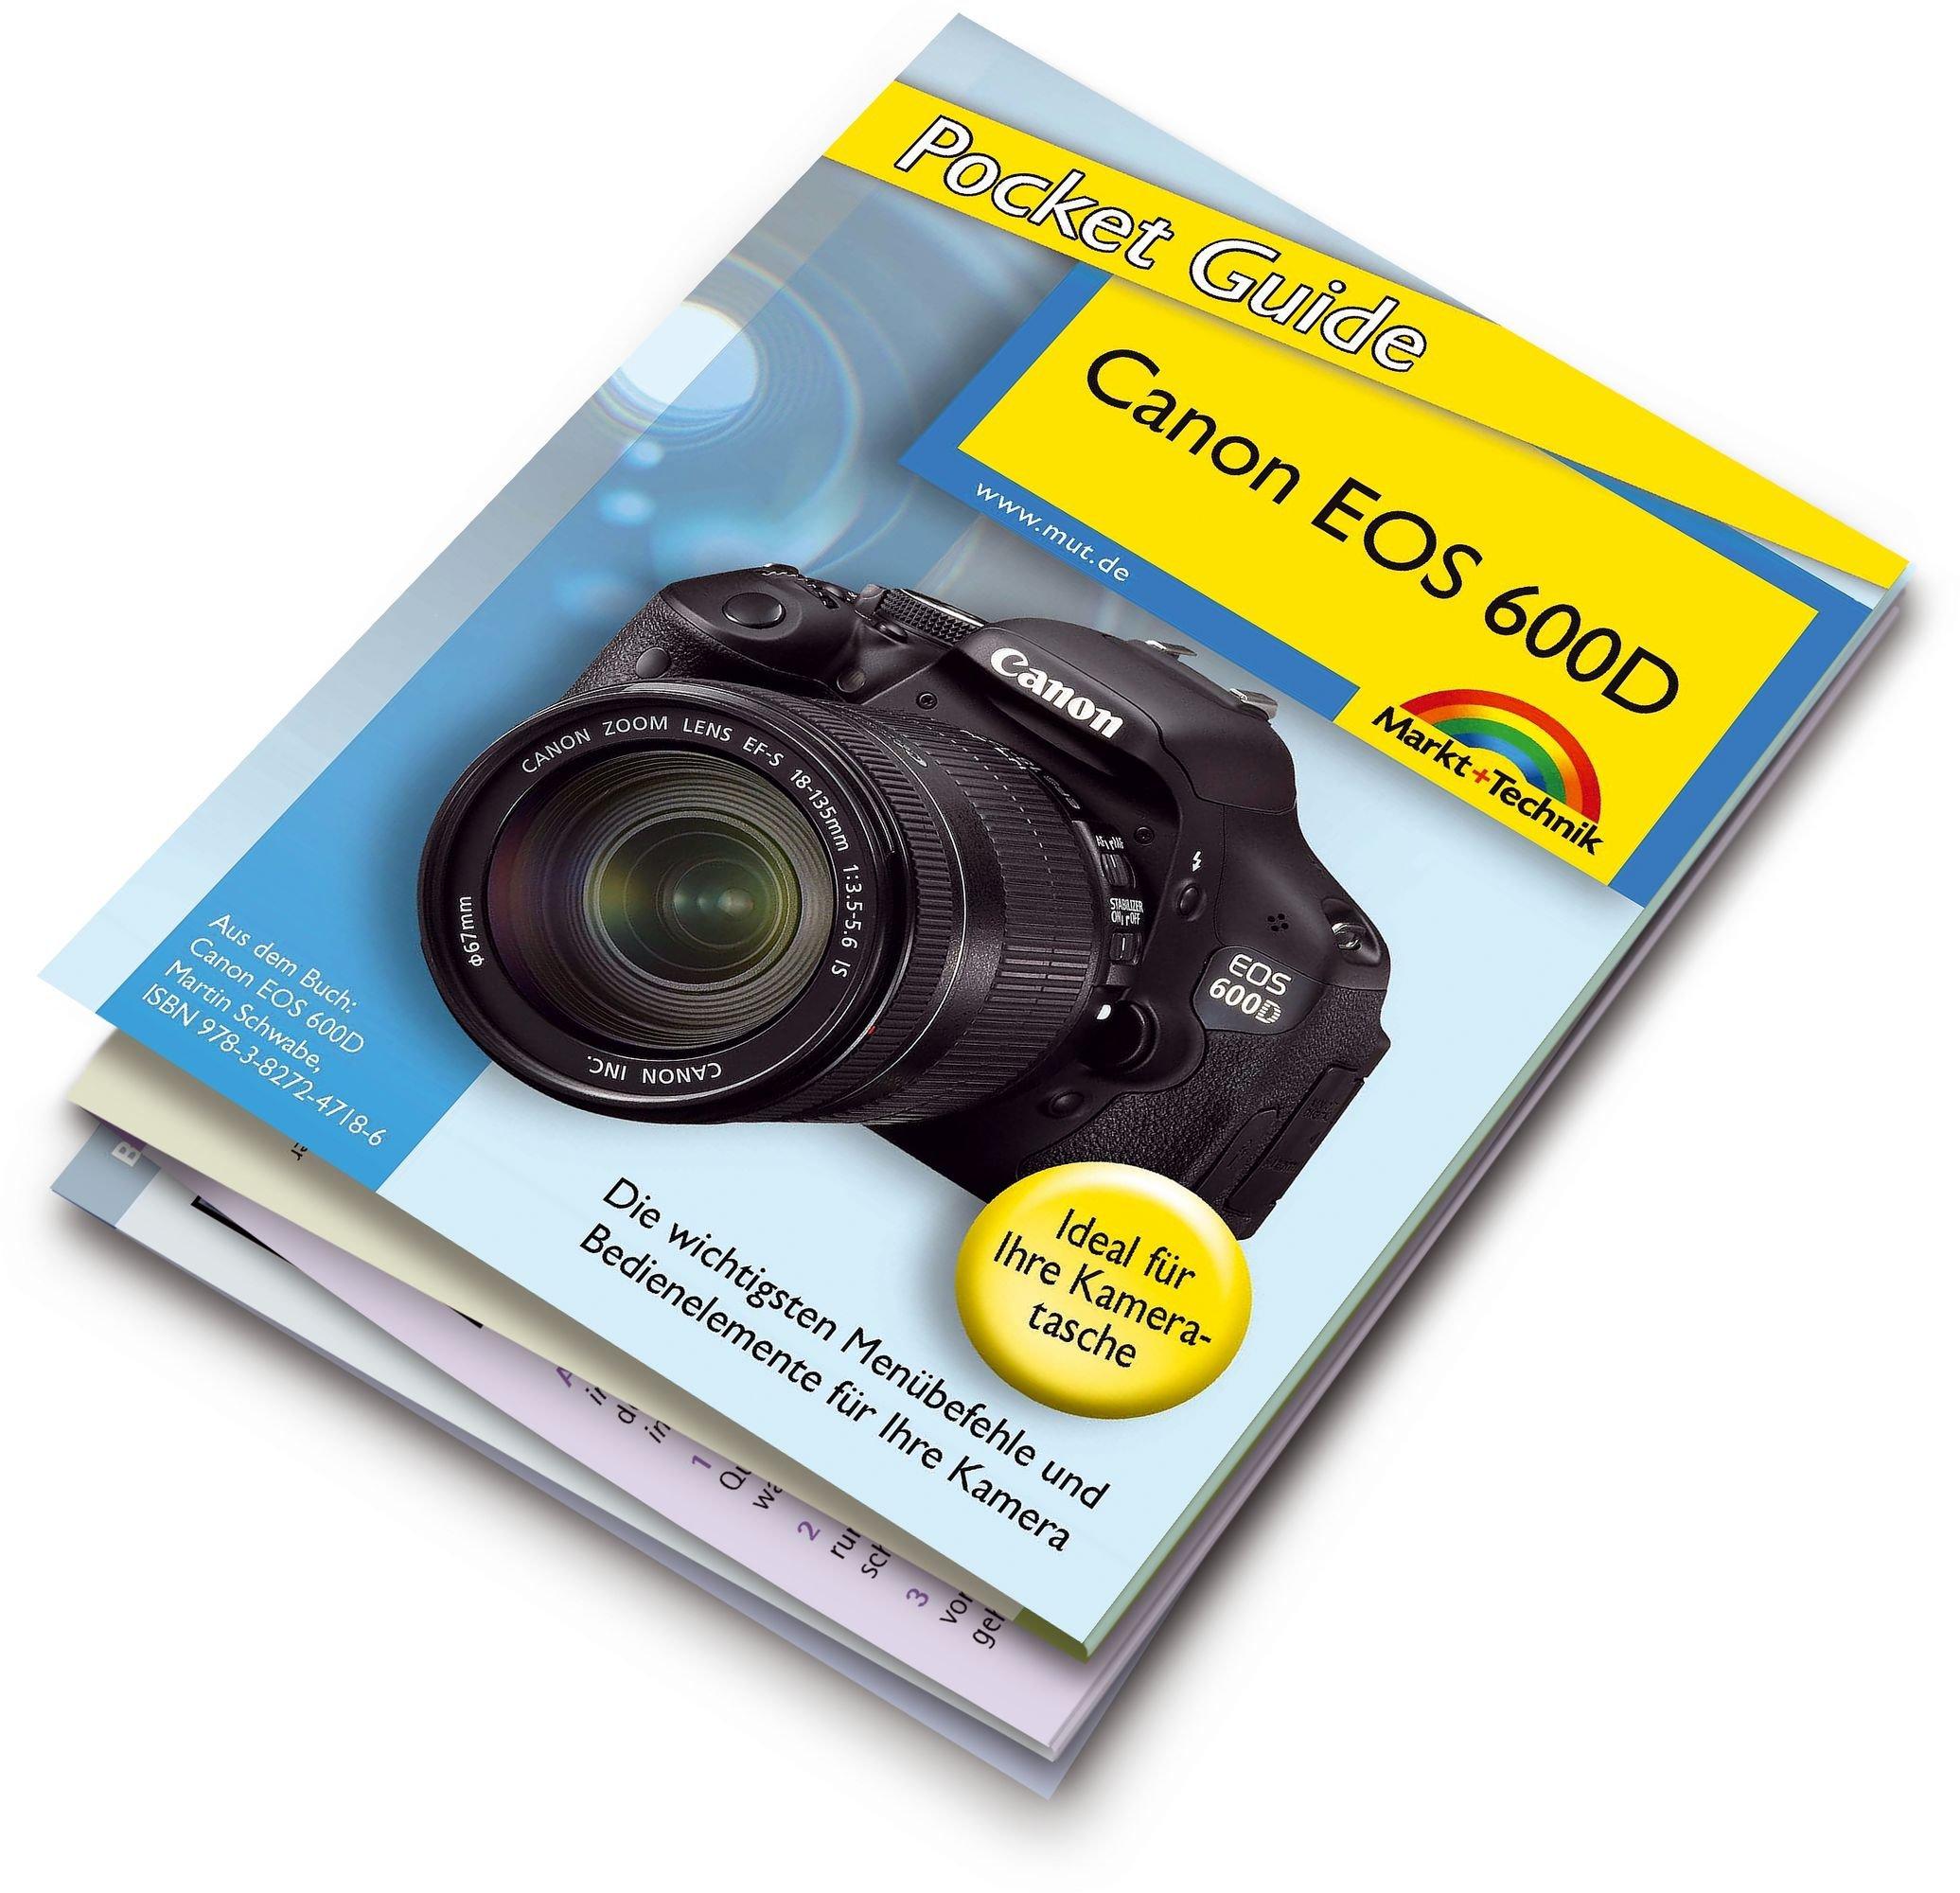 Canon EOS 600D Pocket Guide: 12-seitige Klappkarte